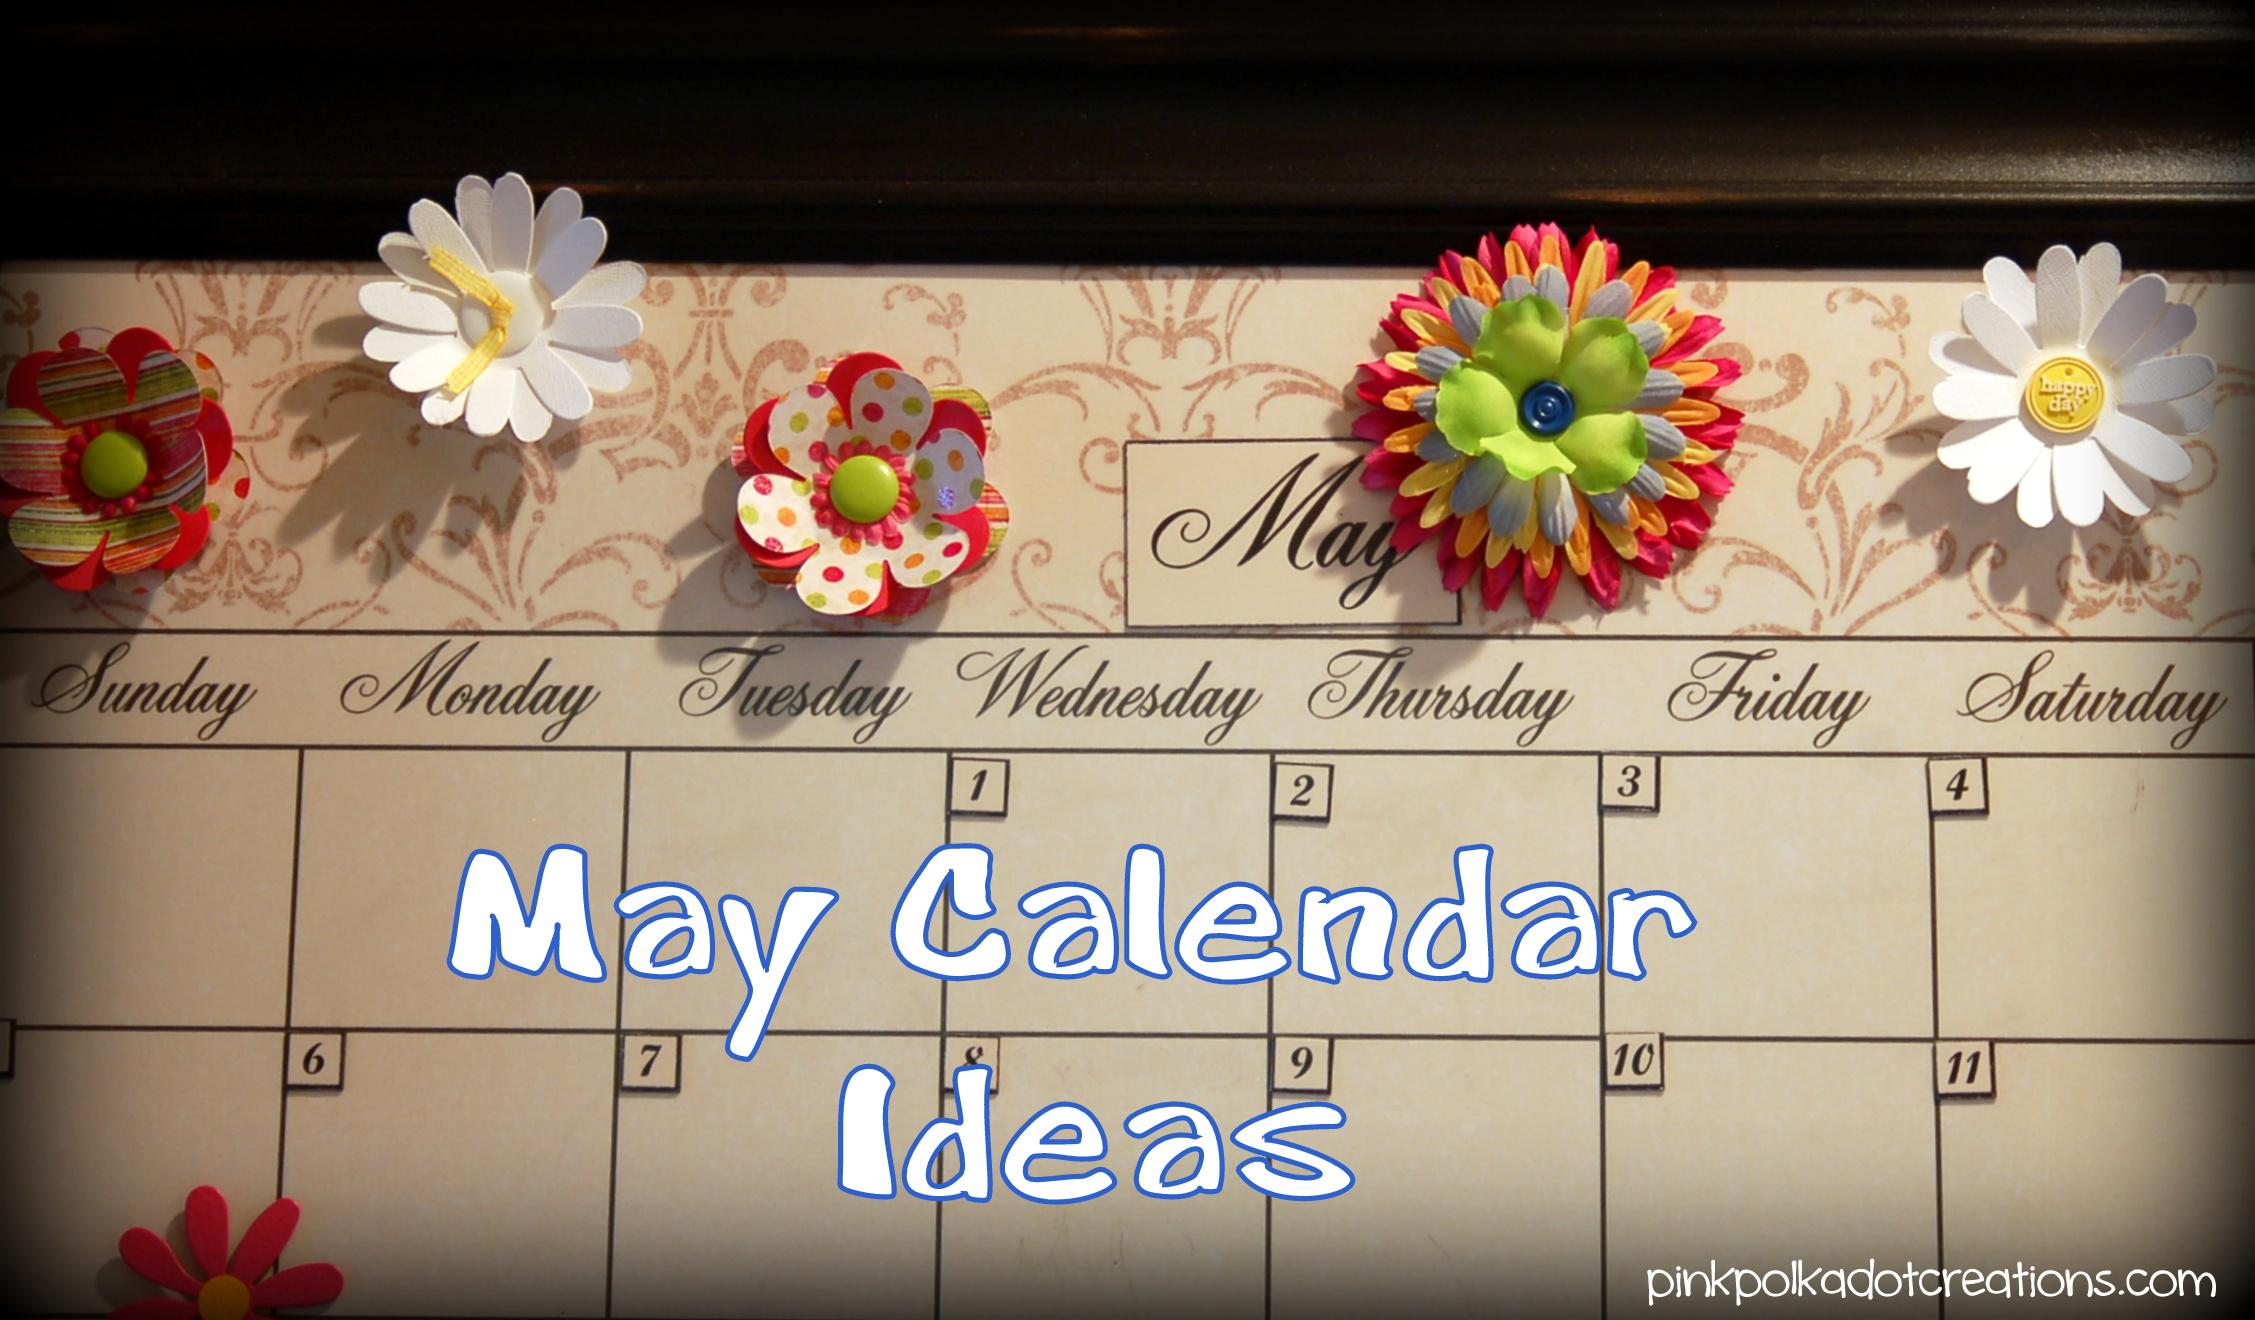 Calendar Ideas For May : May calendar ideas pink polka dot creations